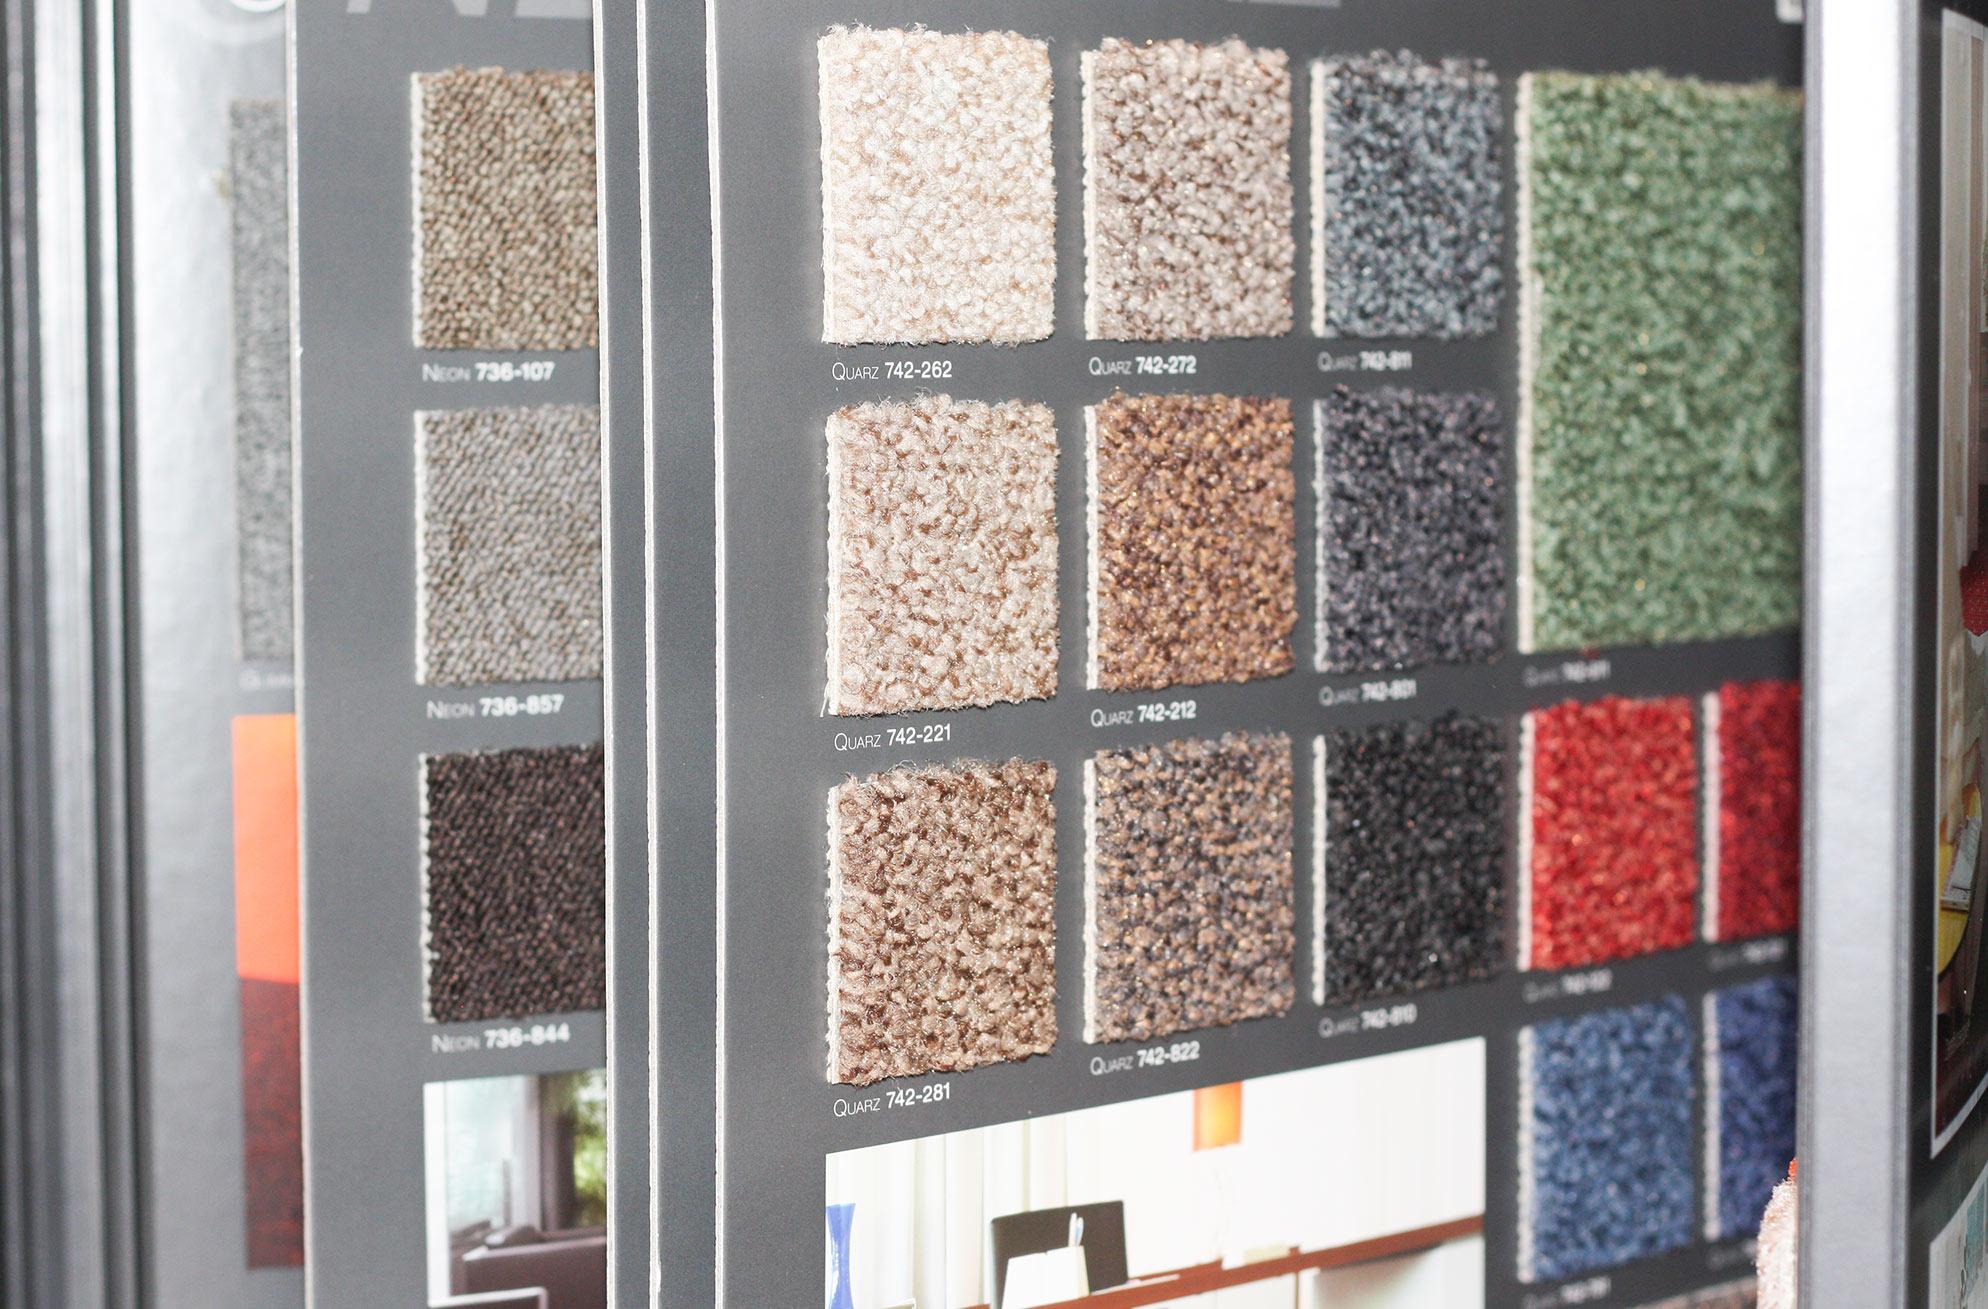 Große Auswahl an Bodenbelägen und -beschichtungen